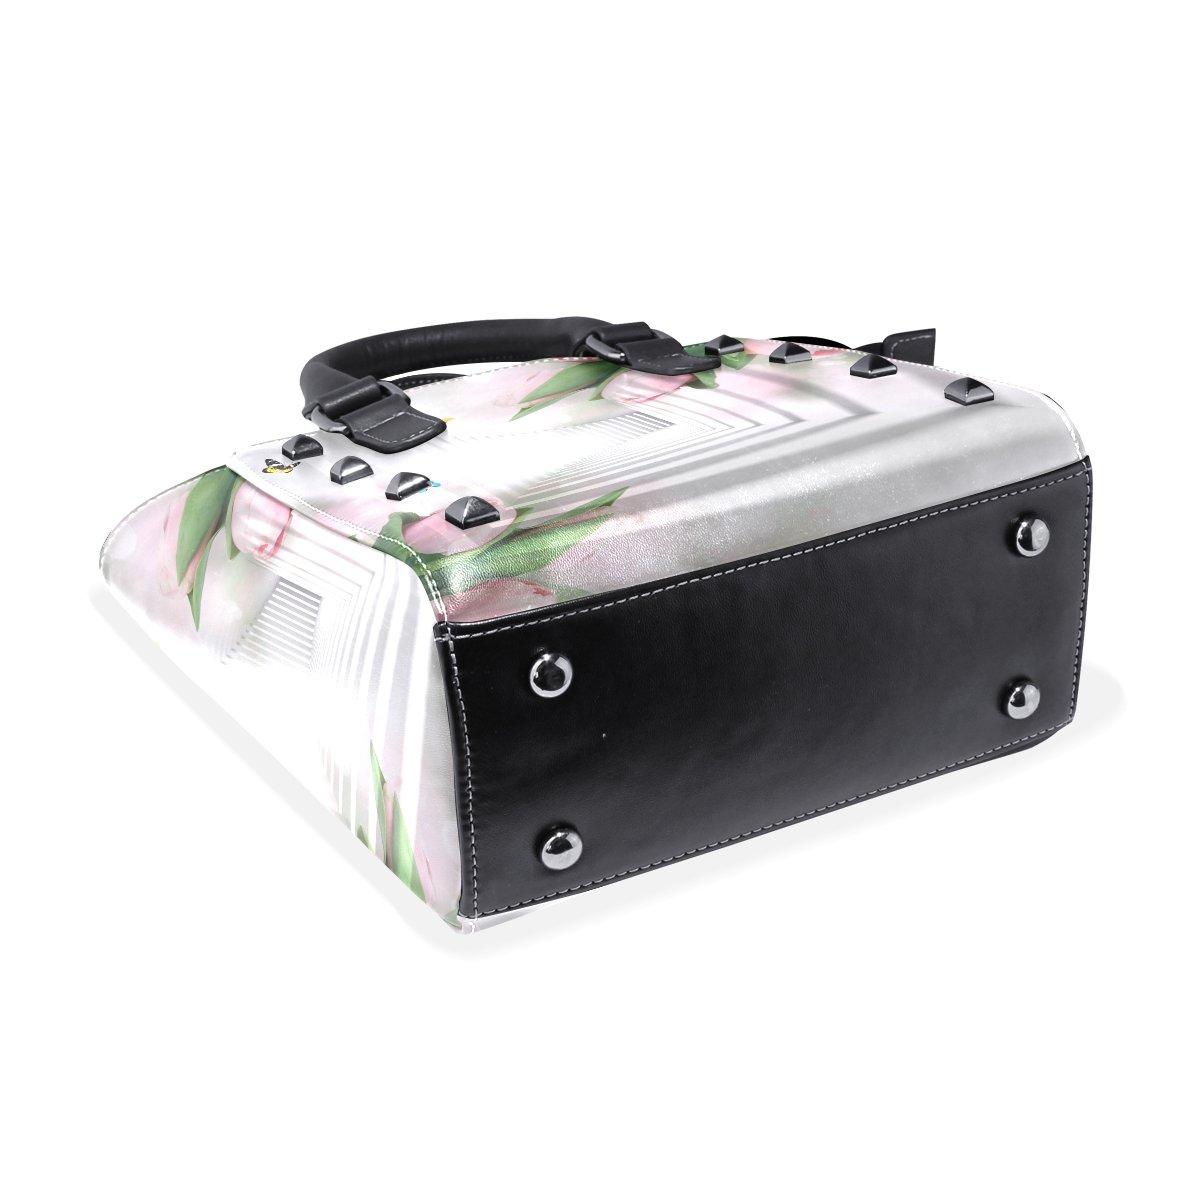 Jennifer 3D Tulip Corridor PU Leather Top-Handle Handbags Single-Shoulder Tote Crossbody Bag Messenger Bags For Women